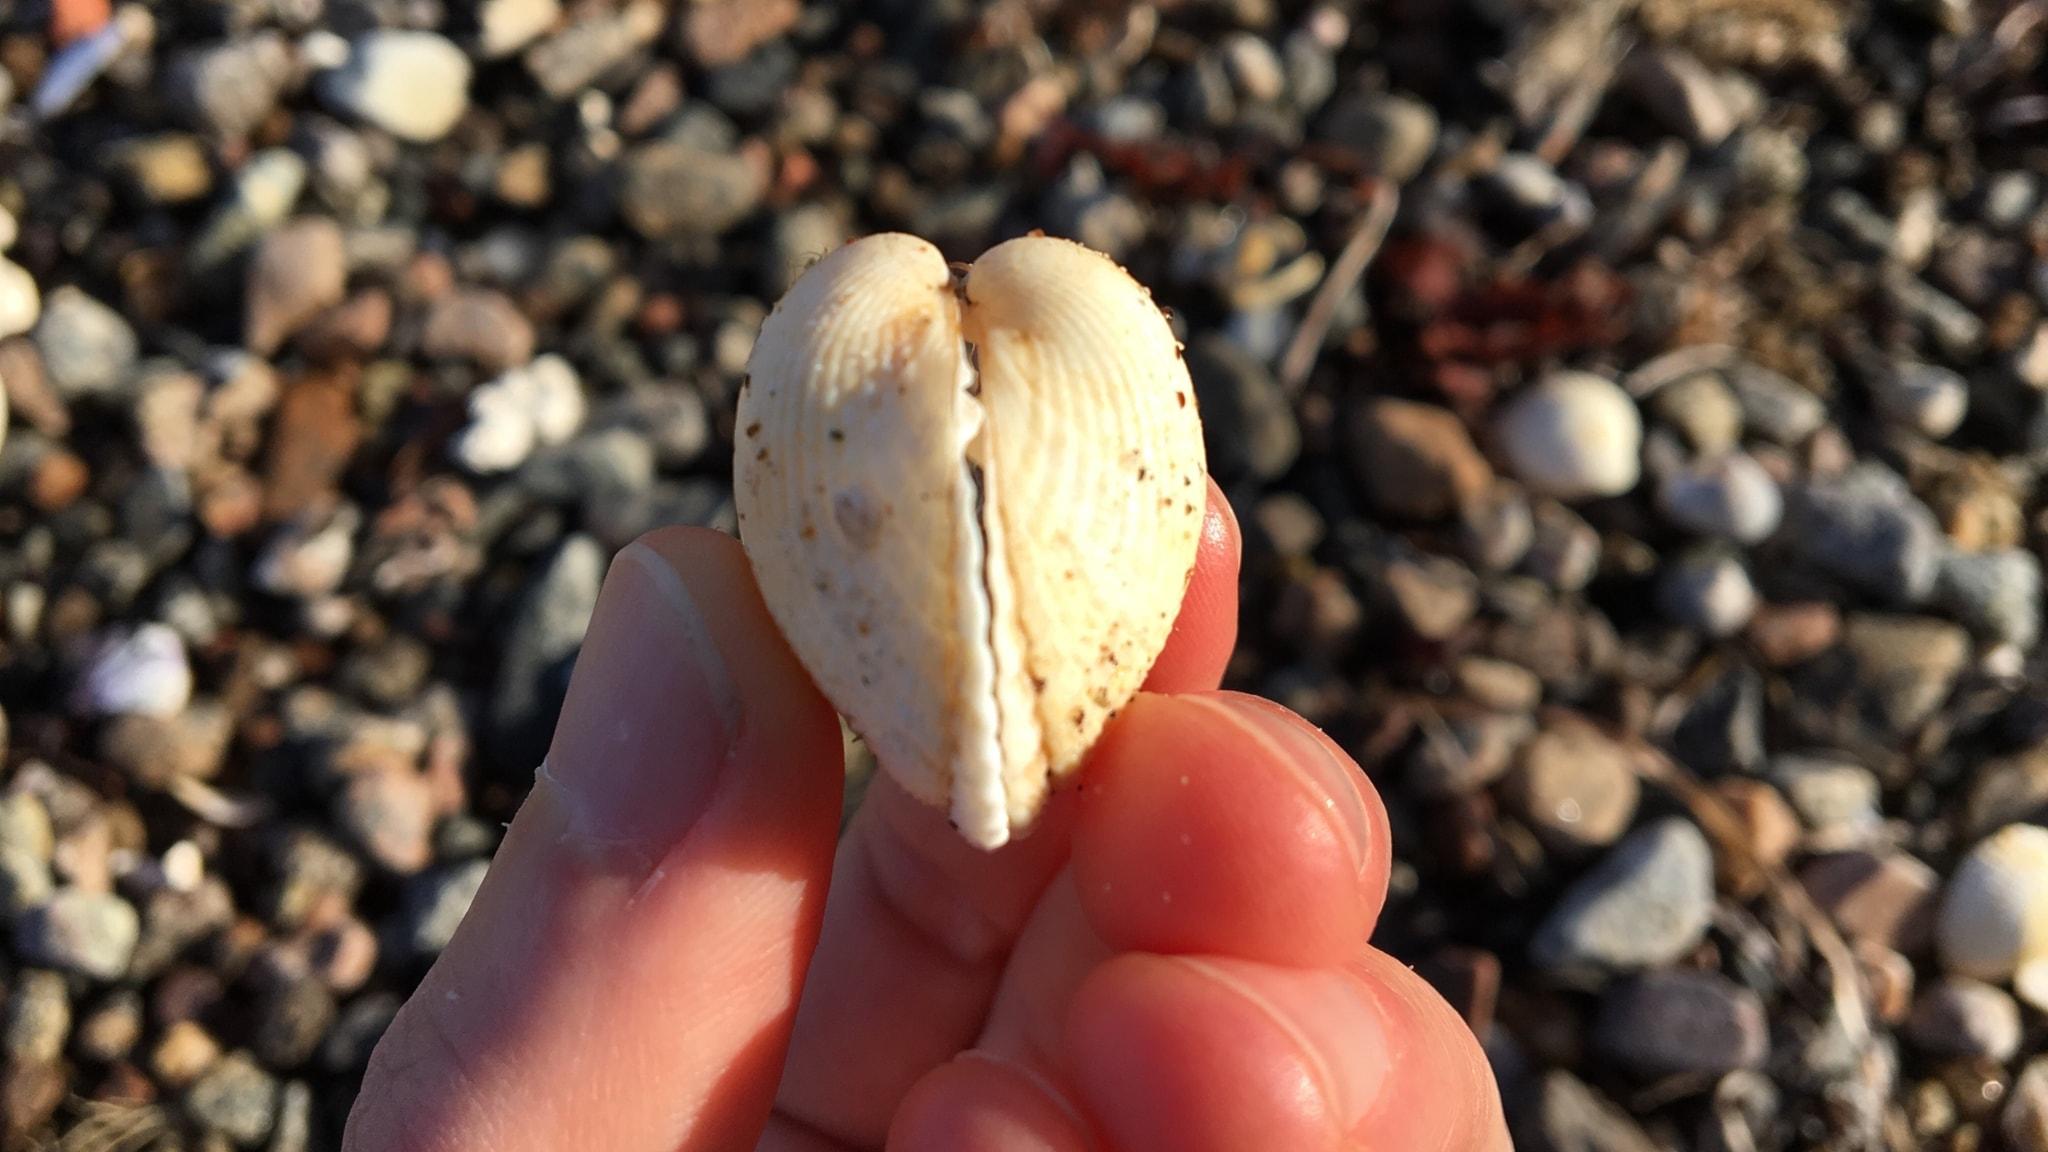 Strandfynd #1: Musslorna